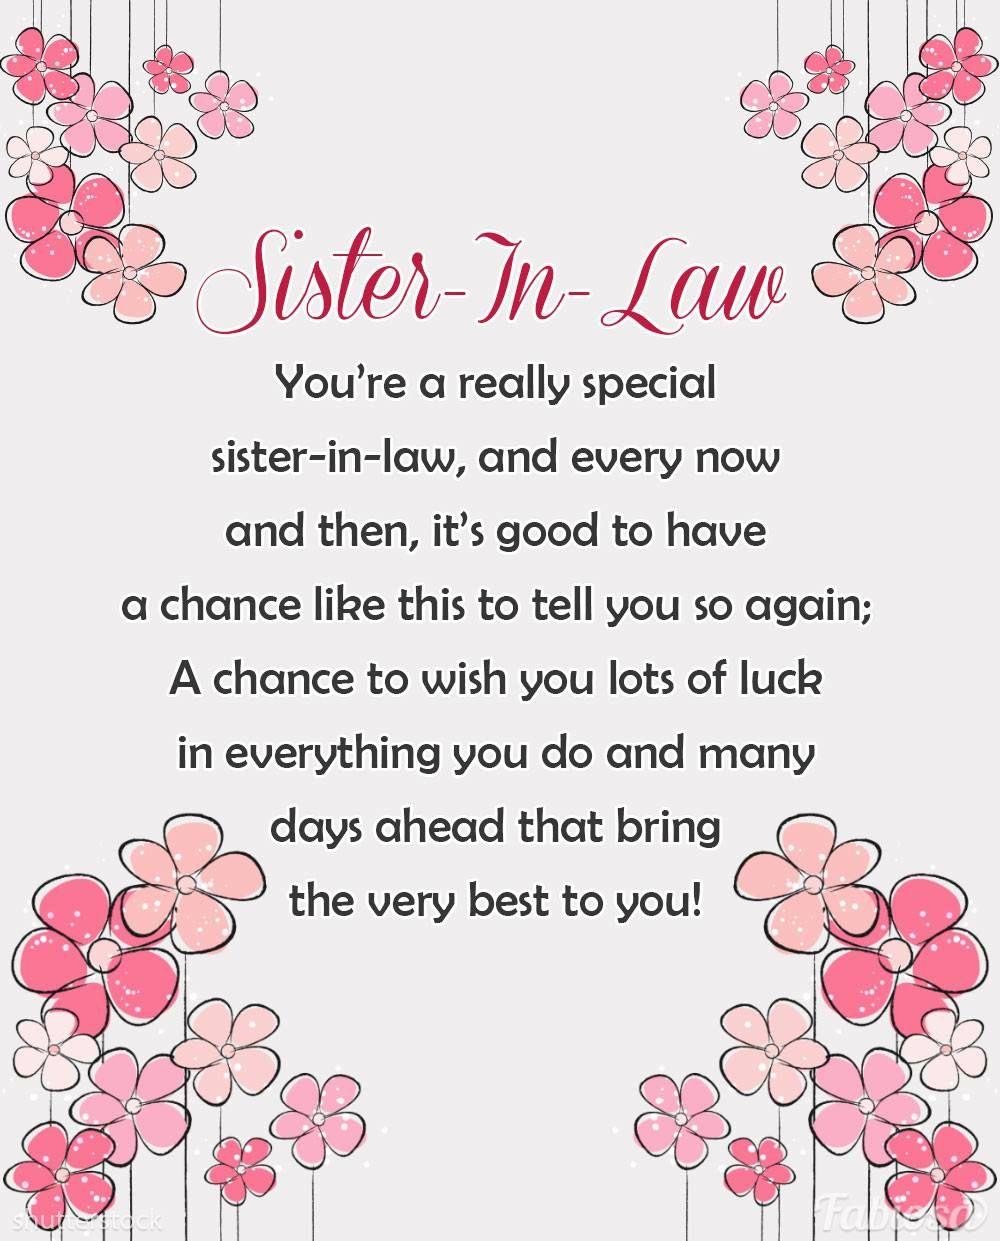 Happy Birthday sister. I love you!🎂💝 Birthday greetings